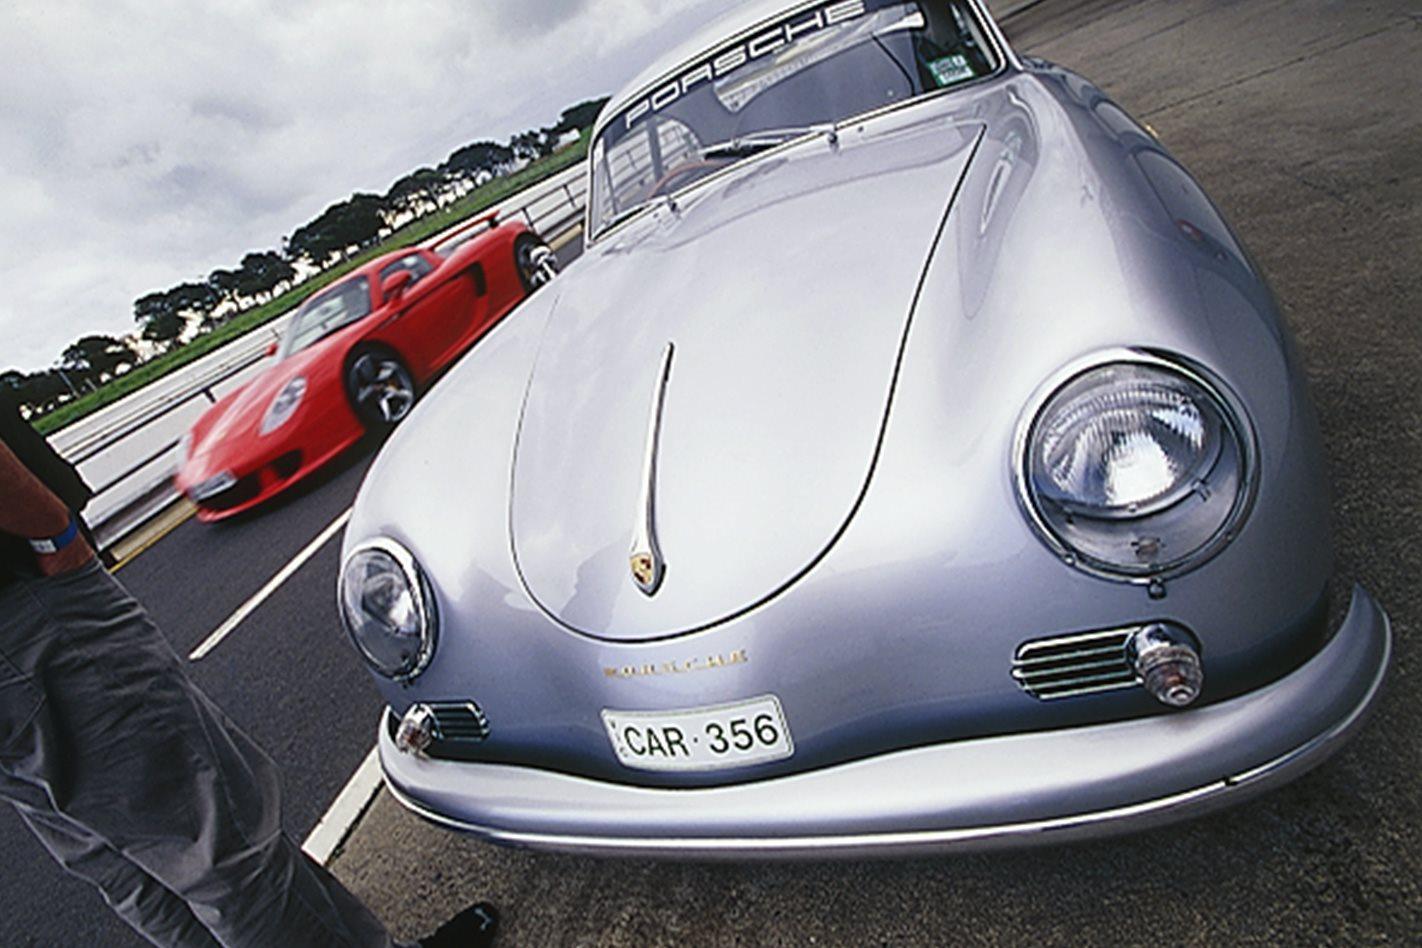 Porsche's 356 Carrera front